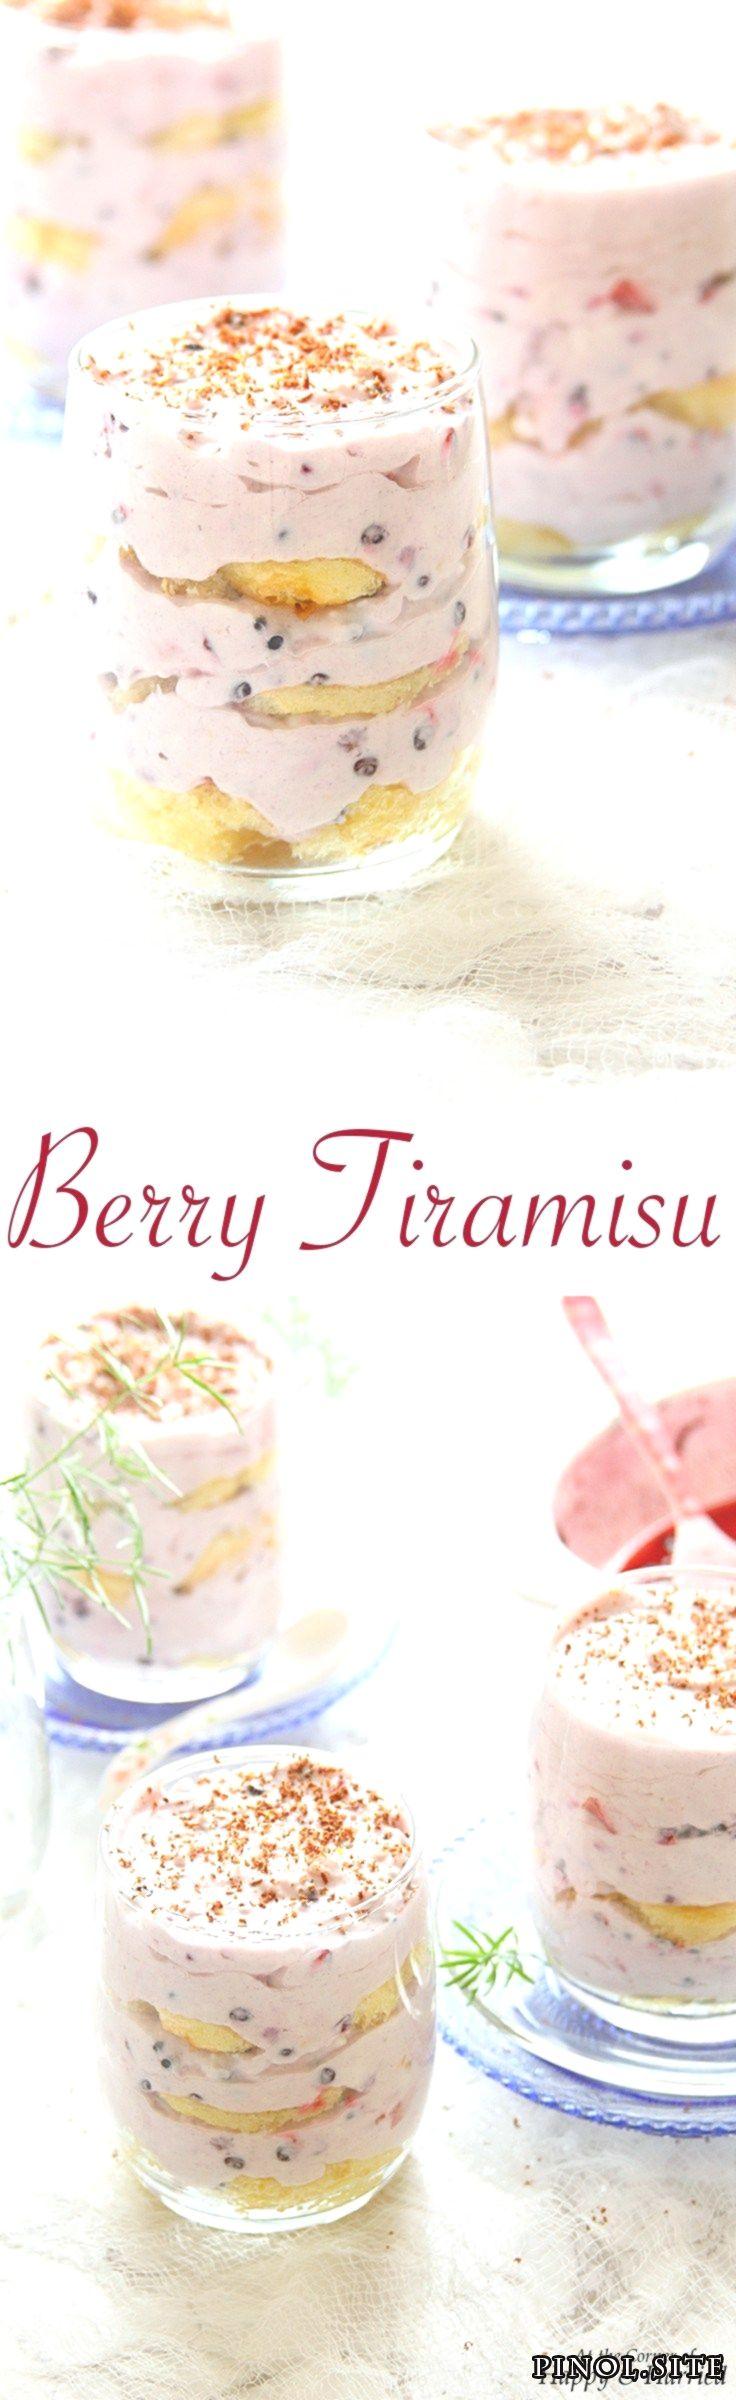 Berry Tiramisu - An Simple & Child Pleasant Dessert Berry Tiramisu - An Simple & Child Pleasant Dessert BERRY TIRAMISU - AN EASY KID FRIENDLY DESSERT - HAPPY&HARRIED... -